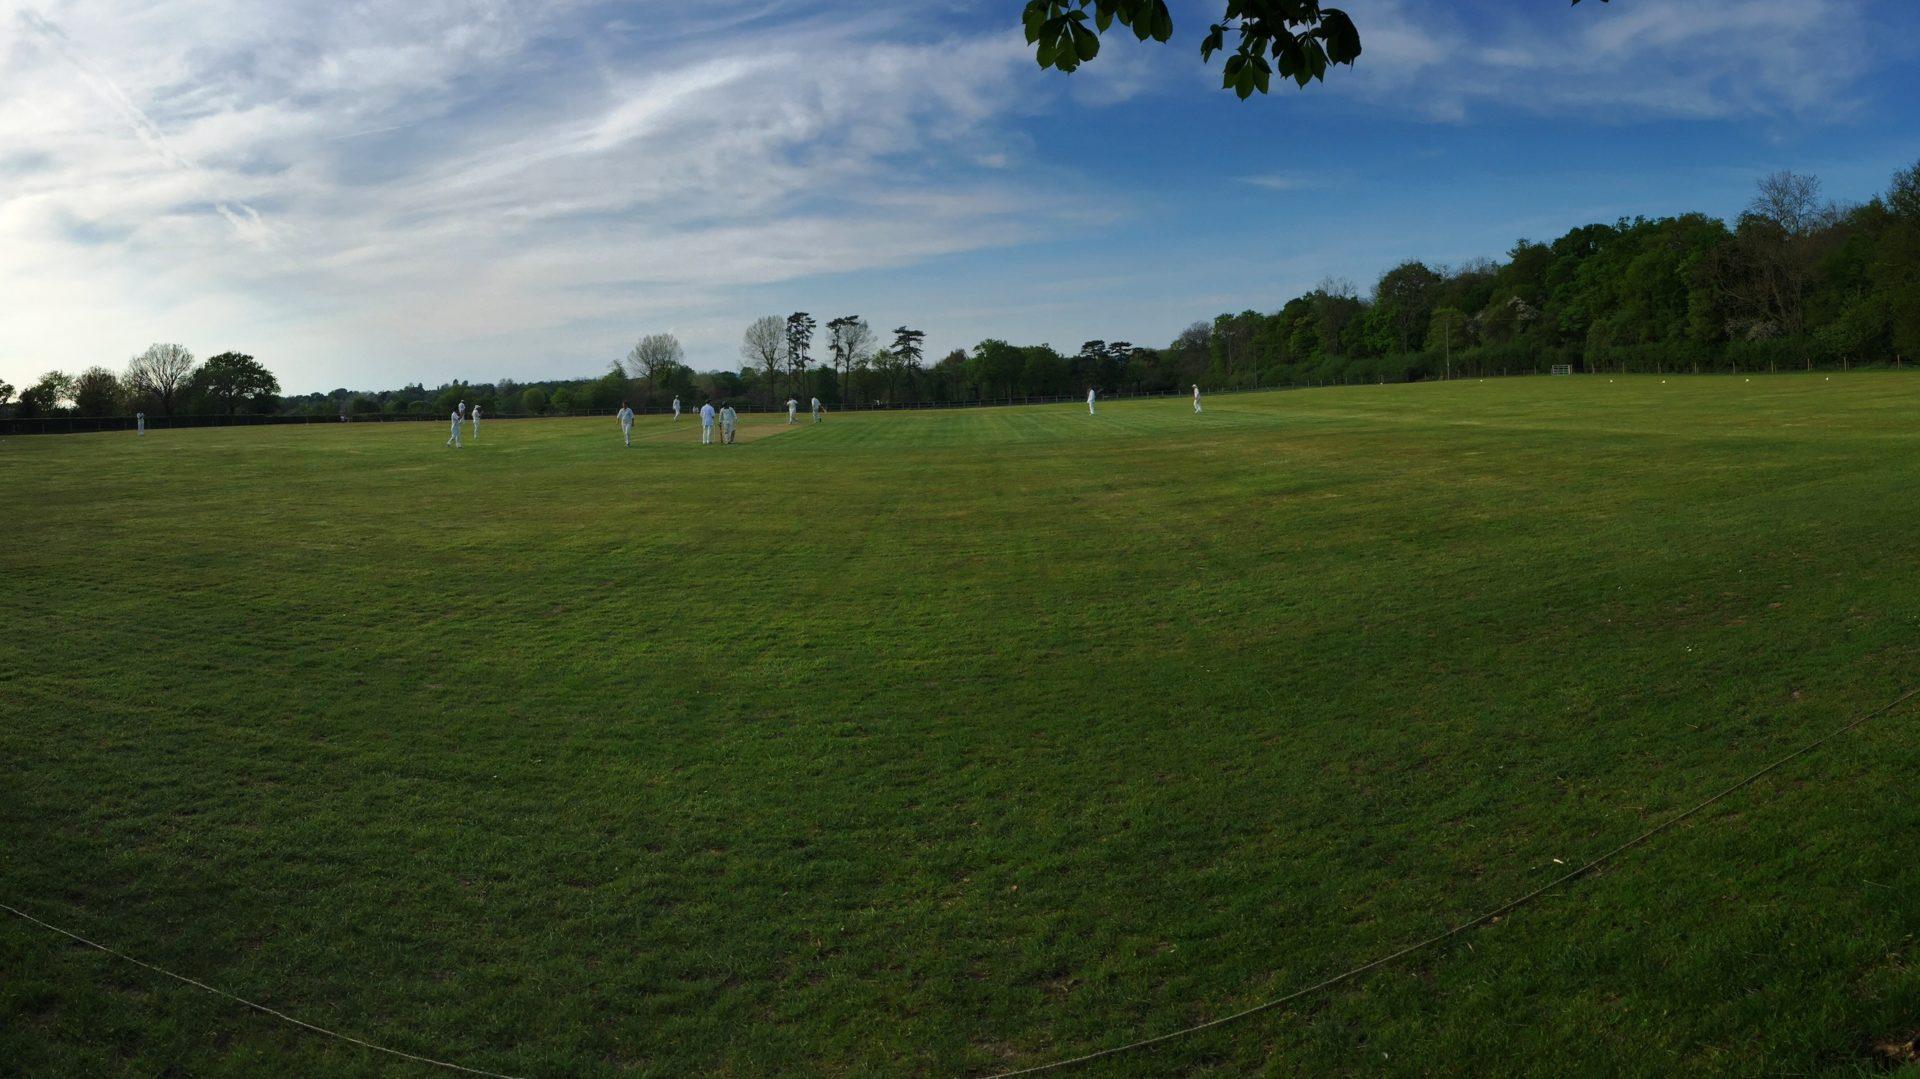 Mynthurst Cricket Club